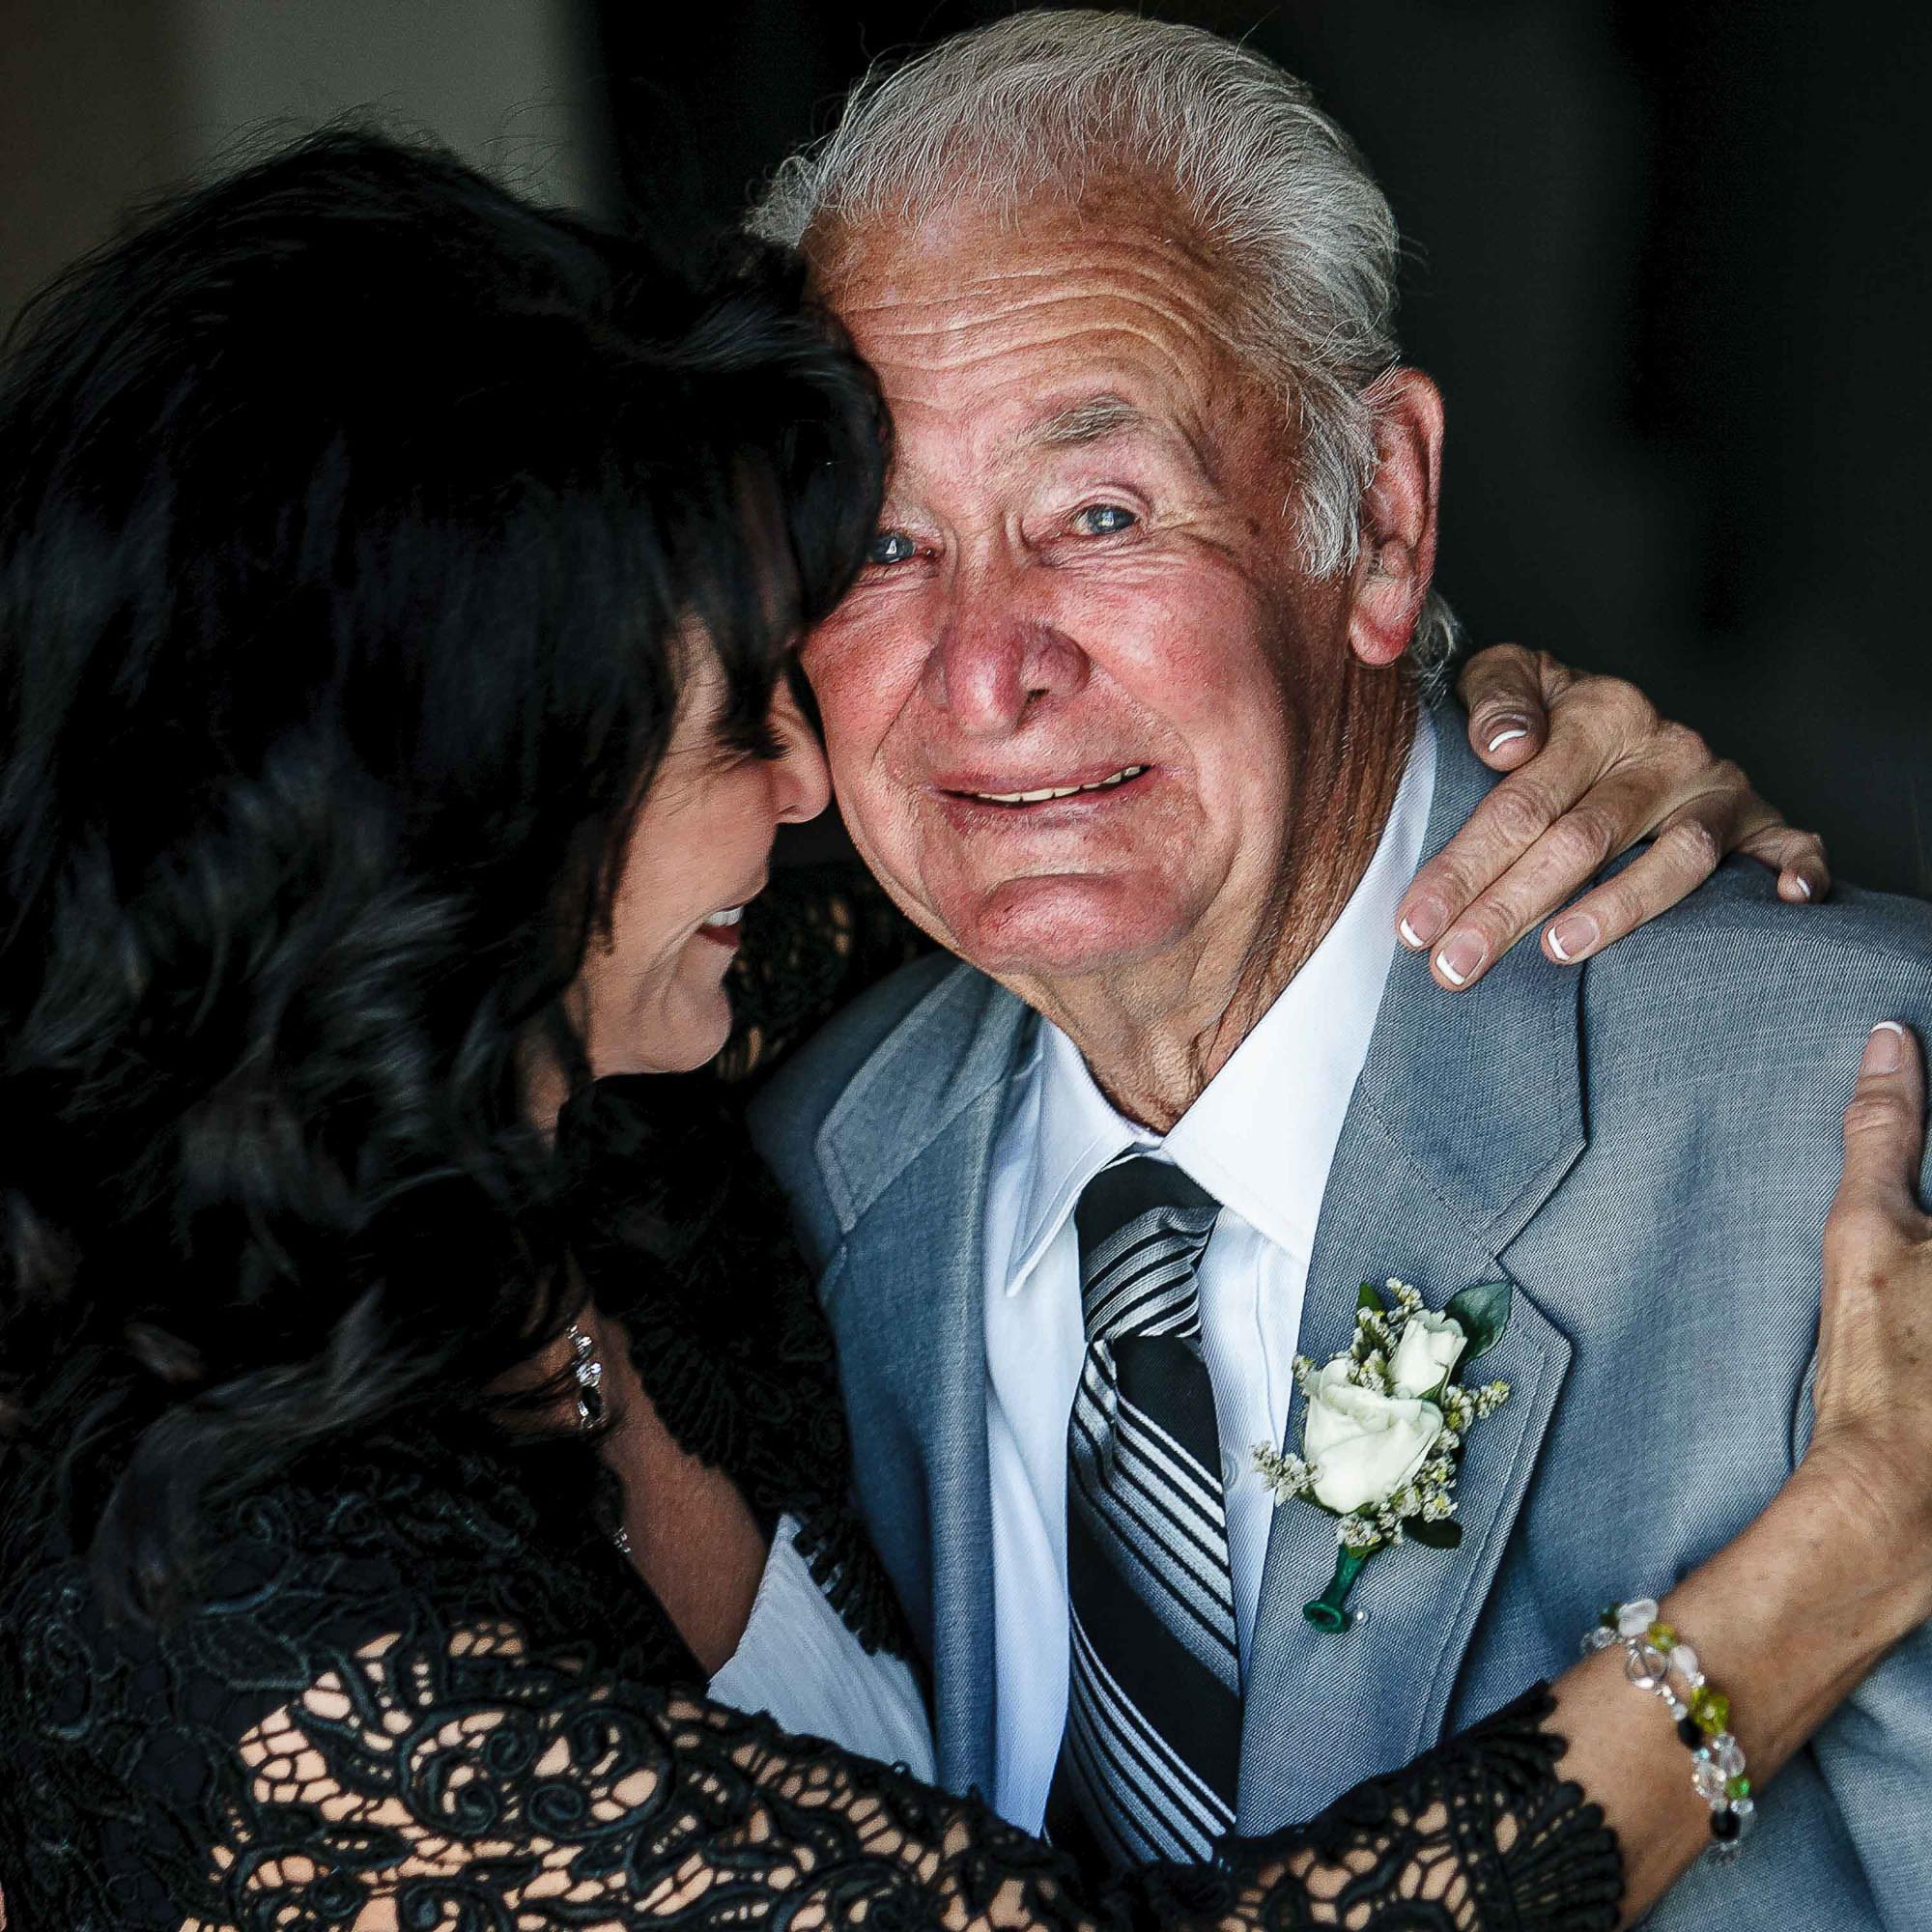 dad-cries-with-bride-worlds-best-wedding-photographers-portland-Jos&Tree.jpg